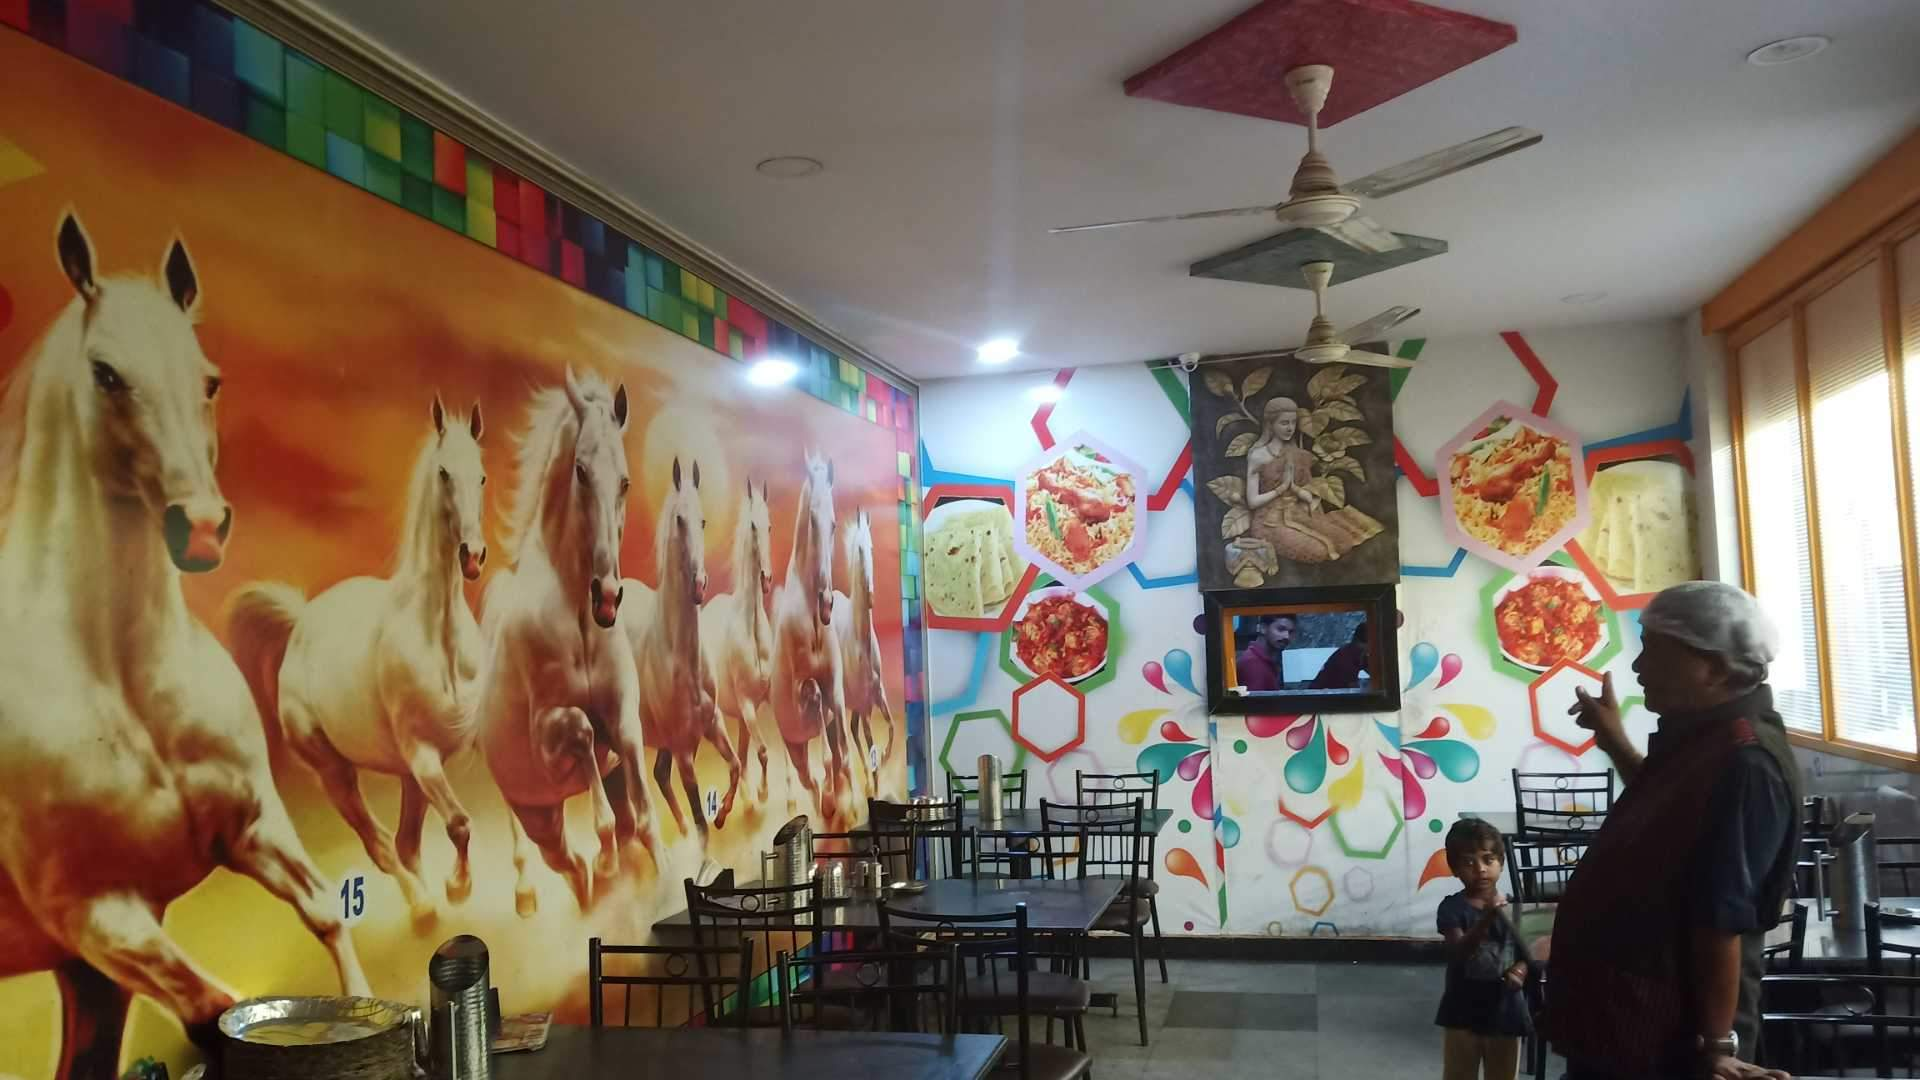 Top 20 Restaurants In Chatanpally Best Restaurants Near Me